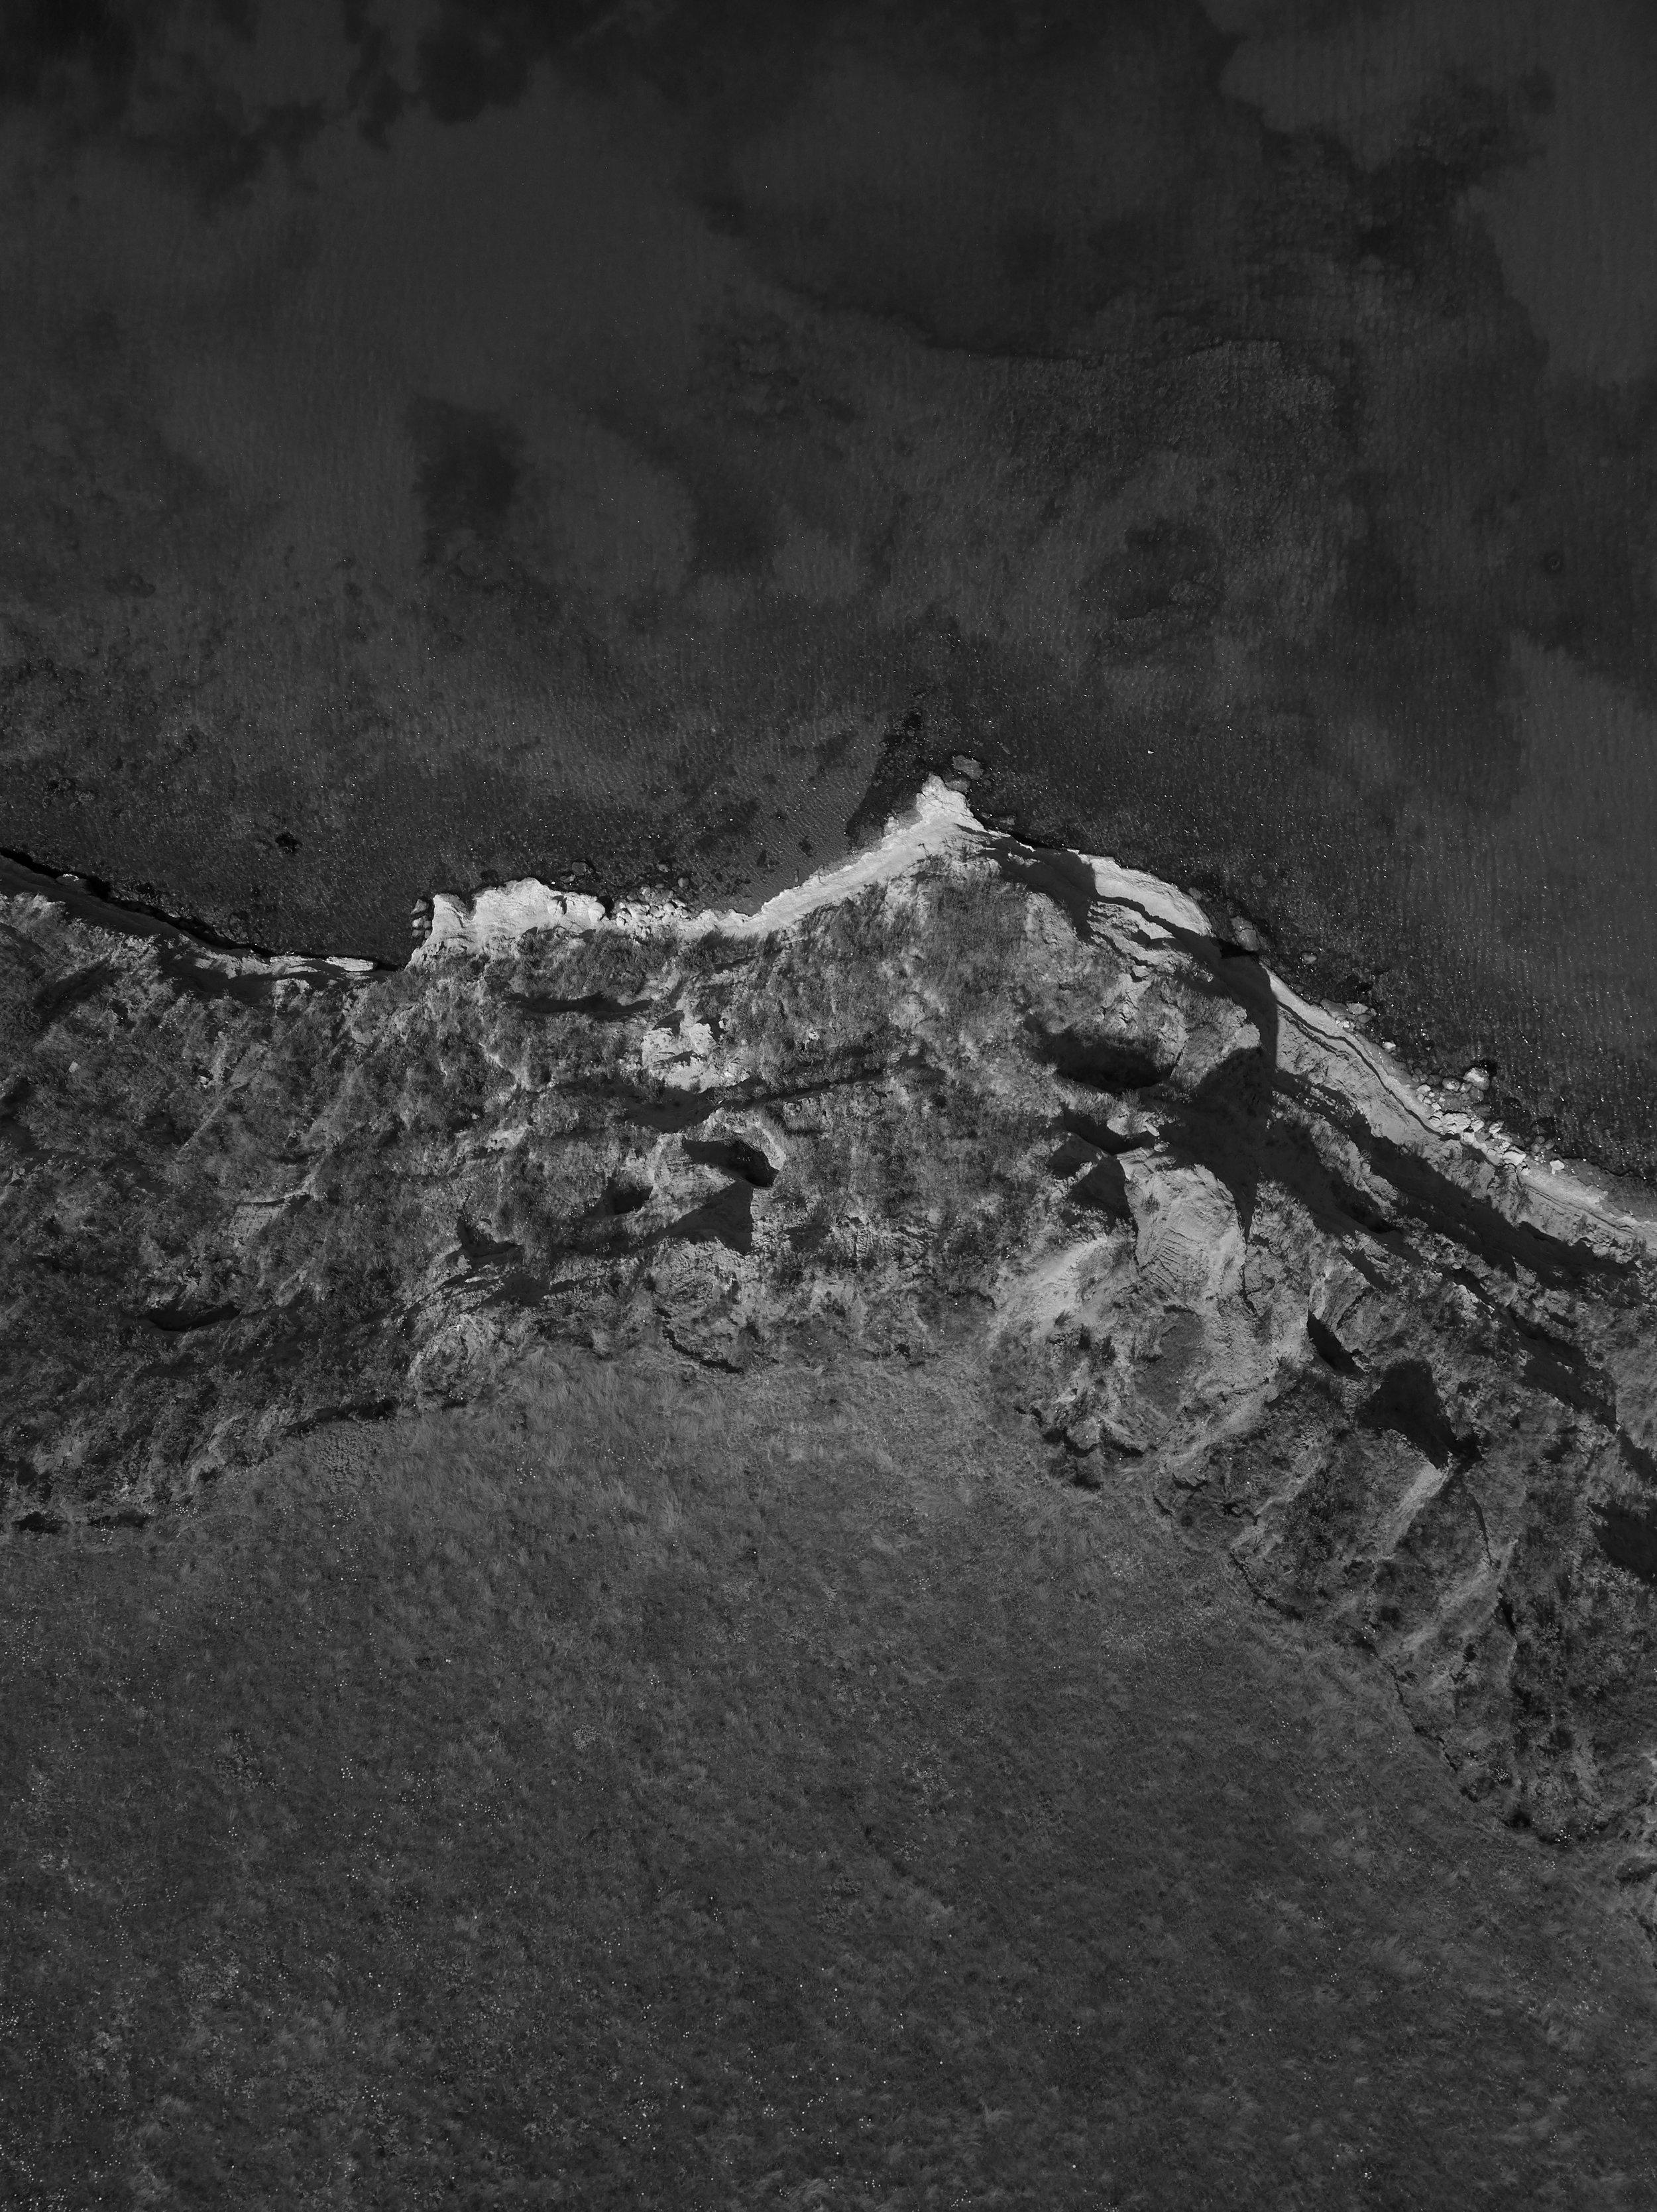 Cliffs_01.jpg